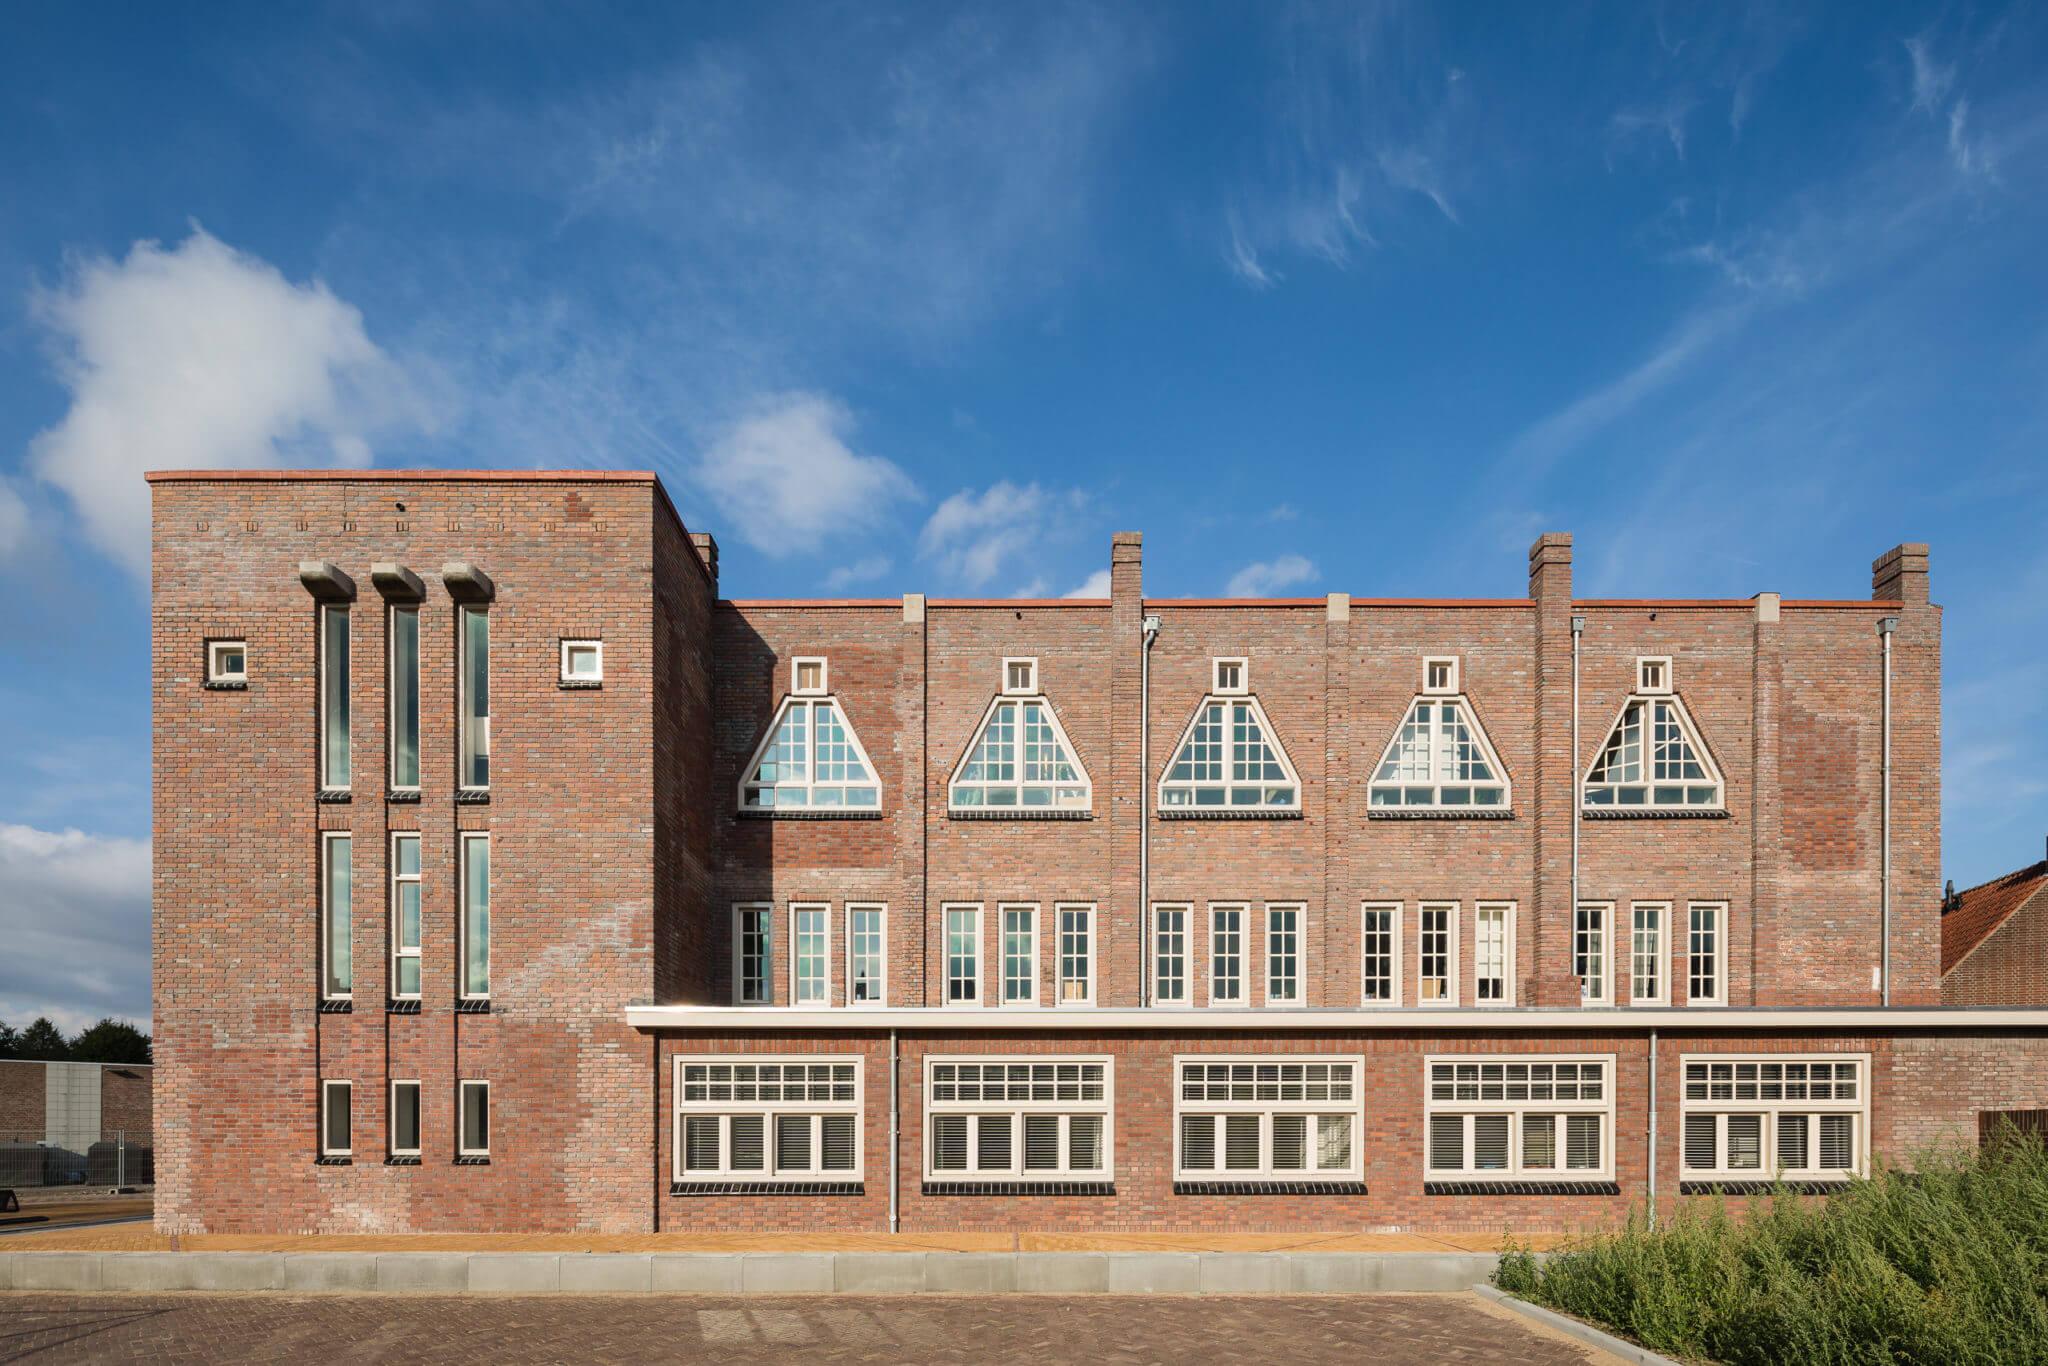 Parochie Helmond Haagje Ambachtscentrum ambacht Rijksmonument traditie bijzonder metselwerk Brabant RAL 2000 back to basic